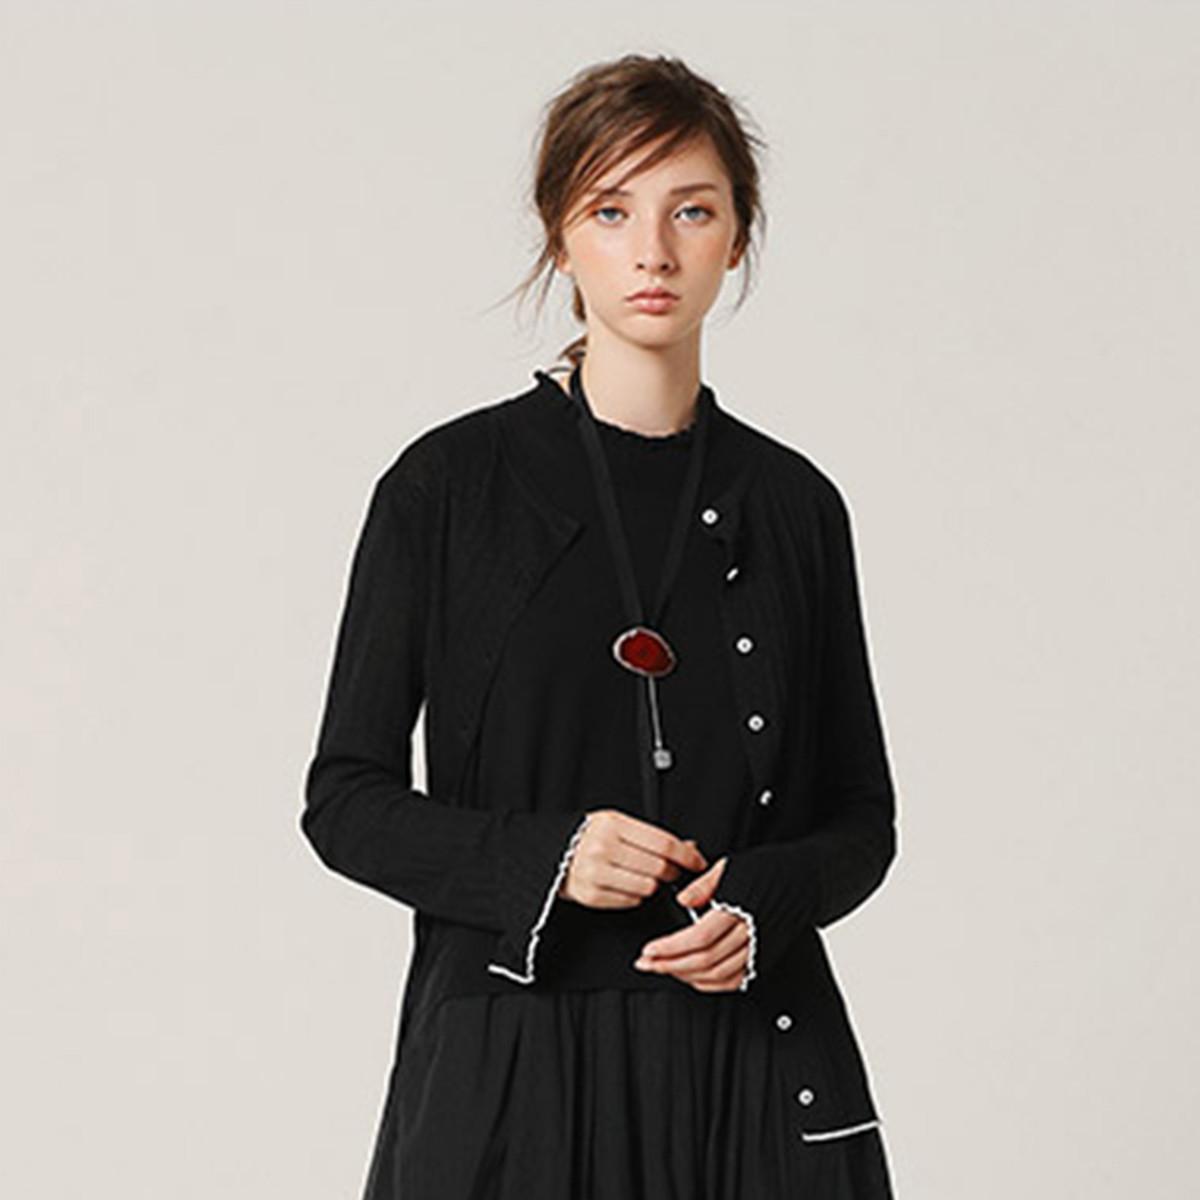 EIN学院风短款针织开衫女舒适轻薄文艺风设计外套秋季新款EIN言EK0203031905